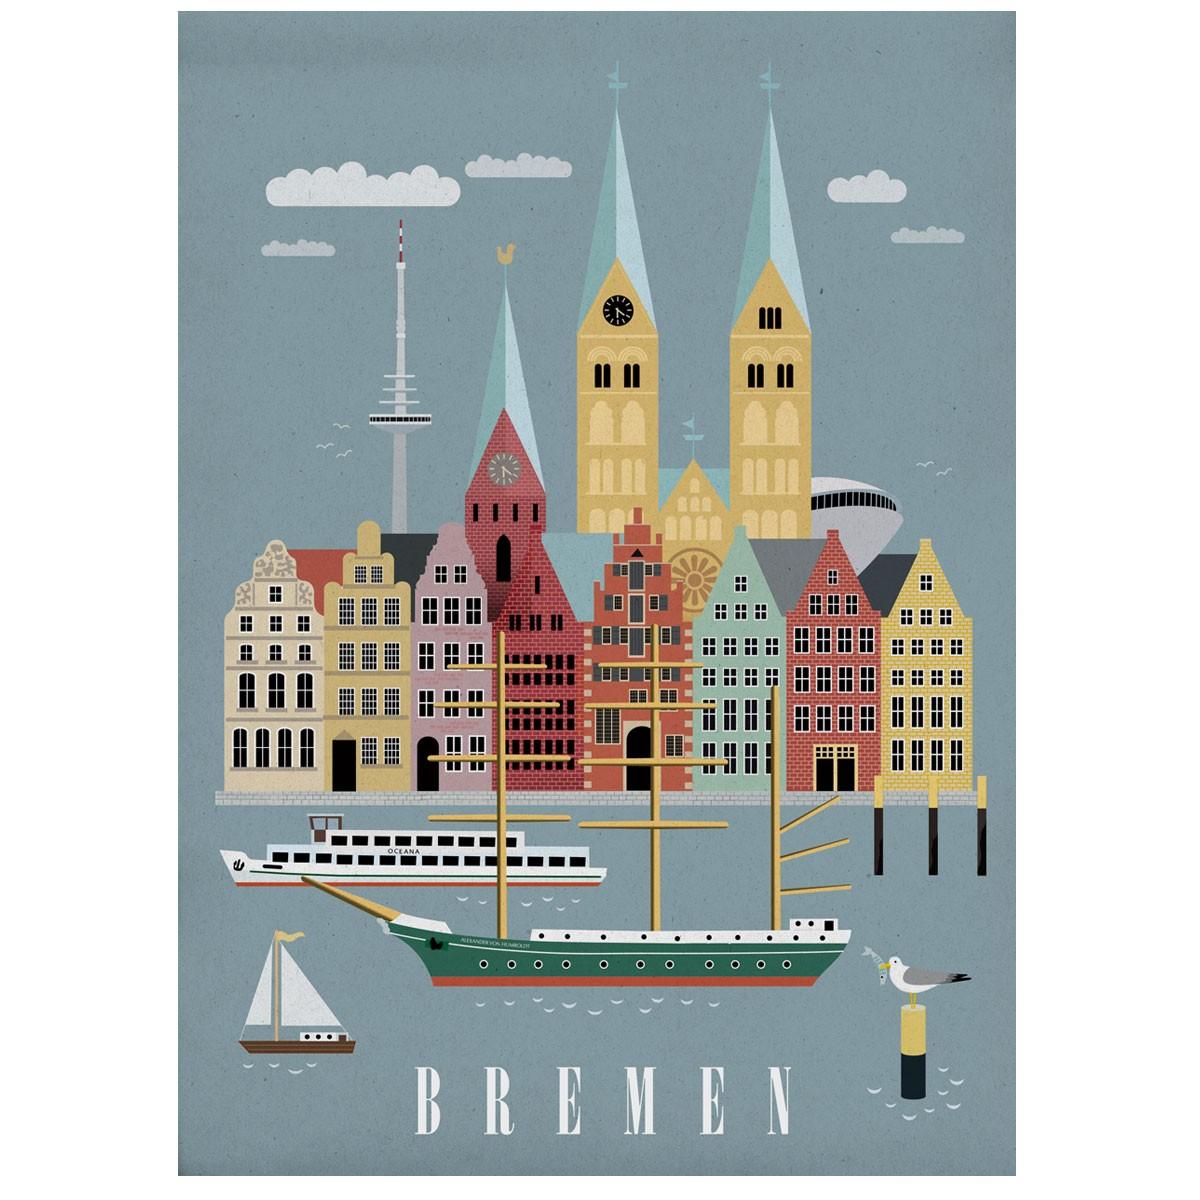 Human Empire Bremen #2 Poster (50x70cm)